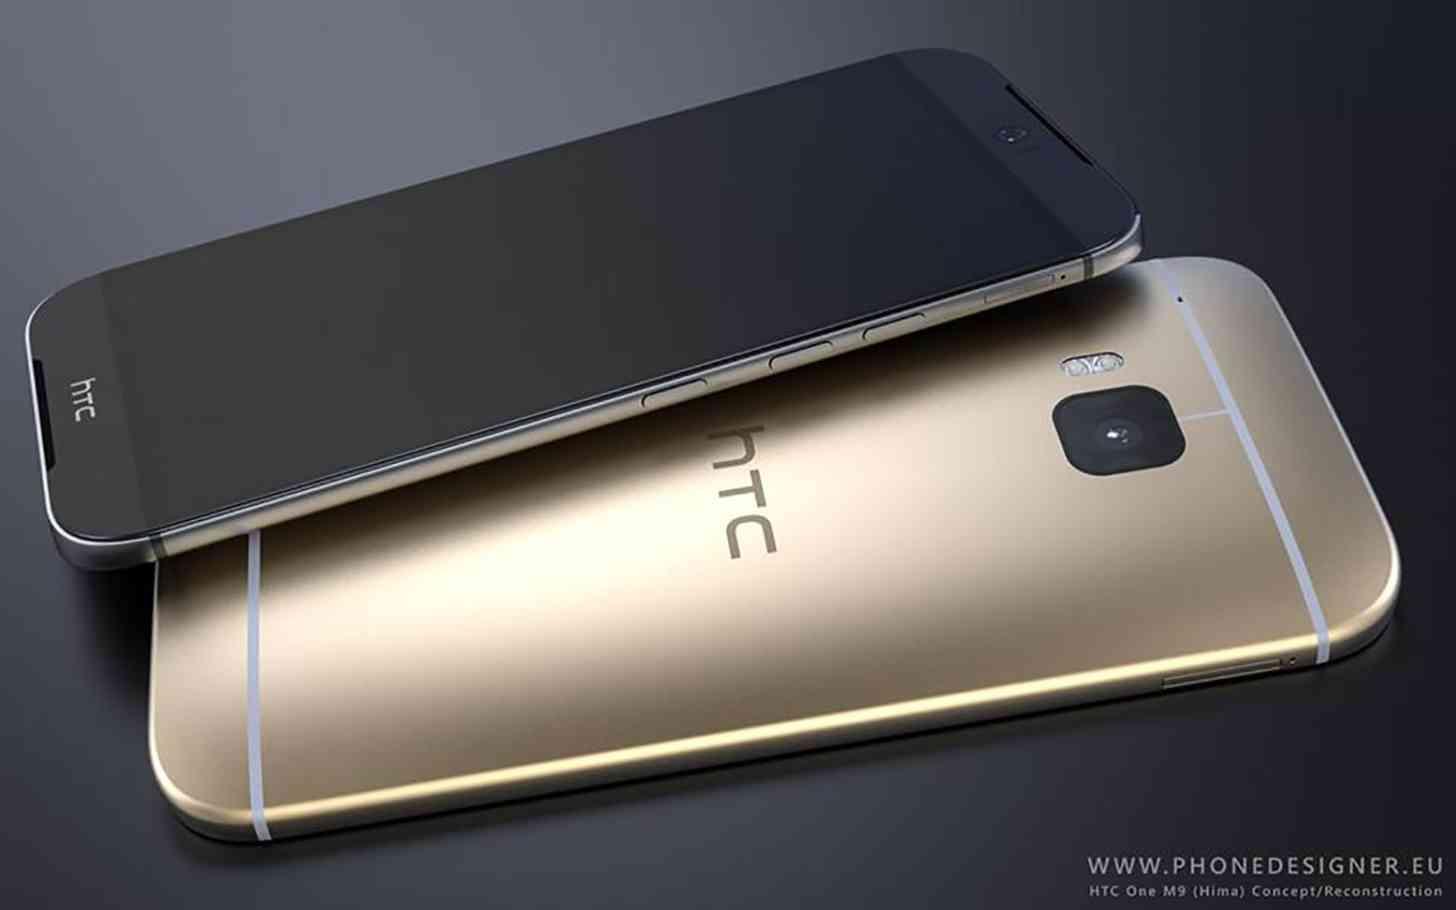 HTC One M9 gold render